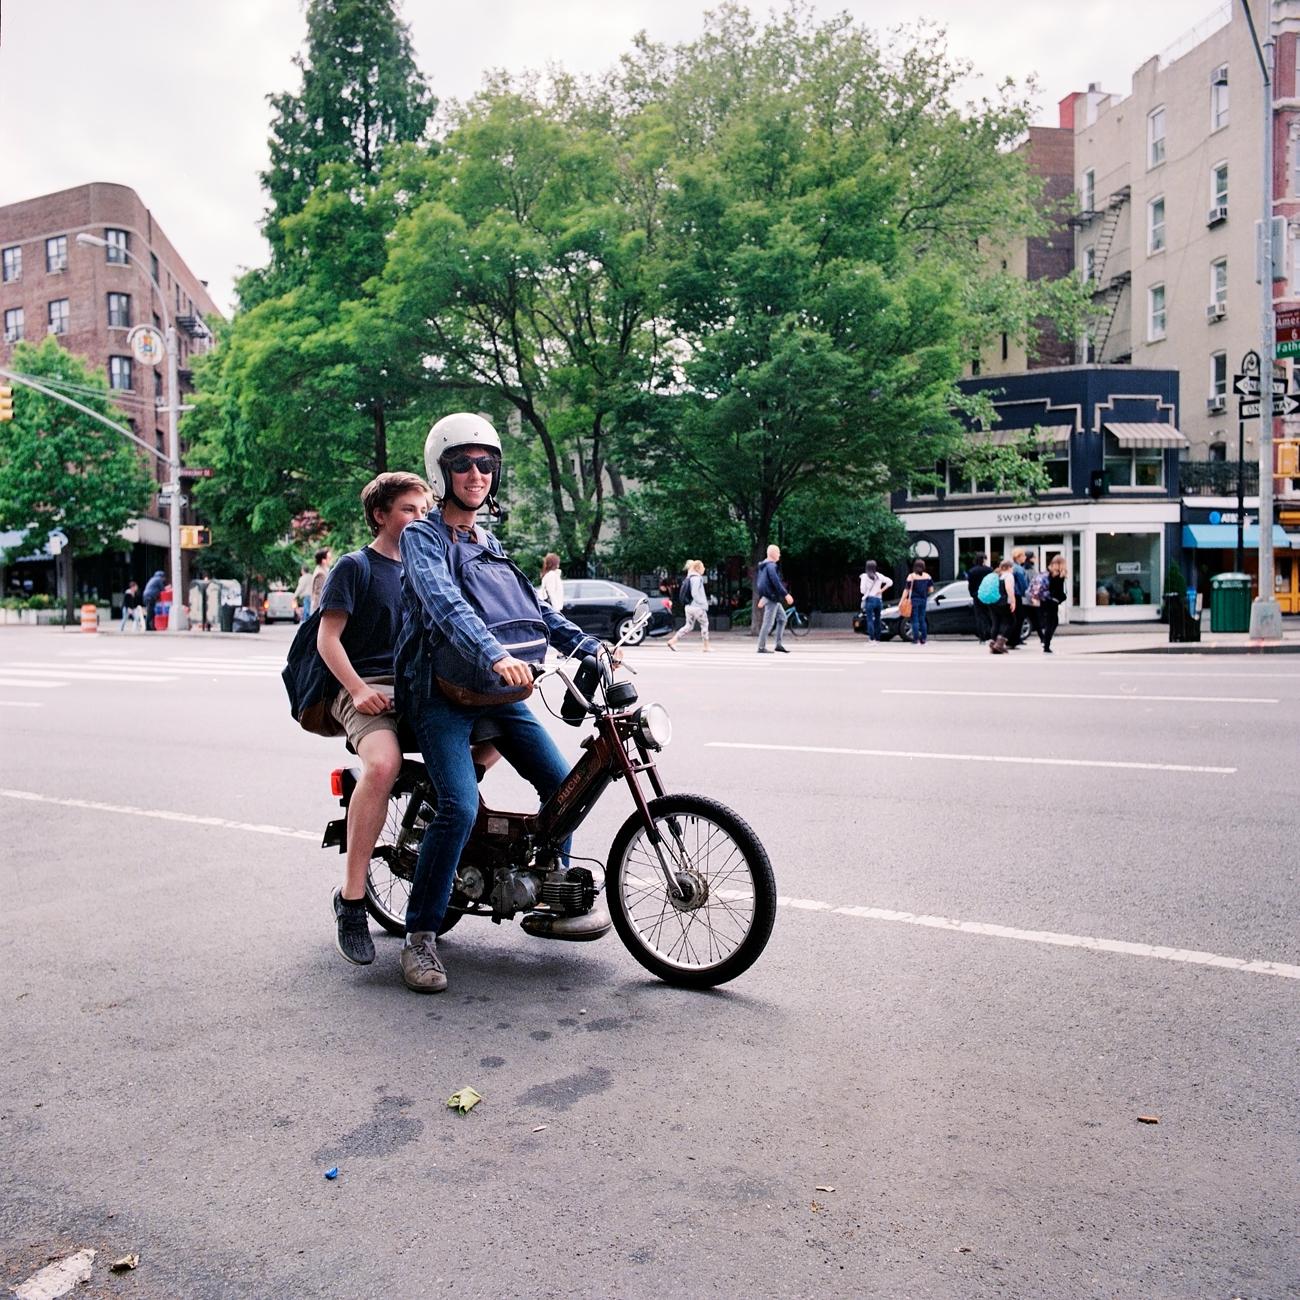 Maud WALAS Street photography NEW YORK 09.jpg